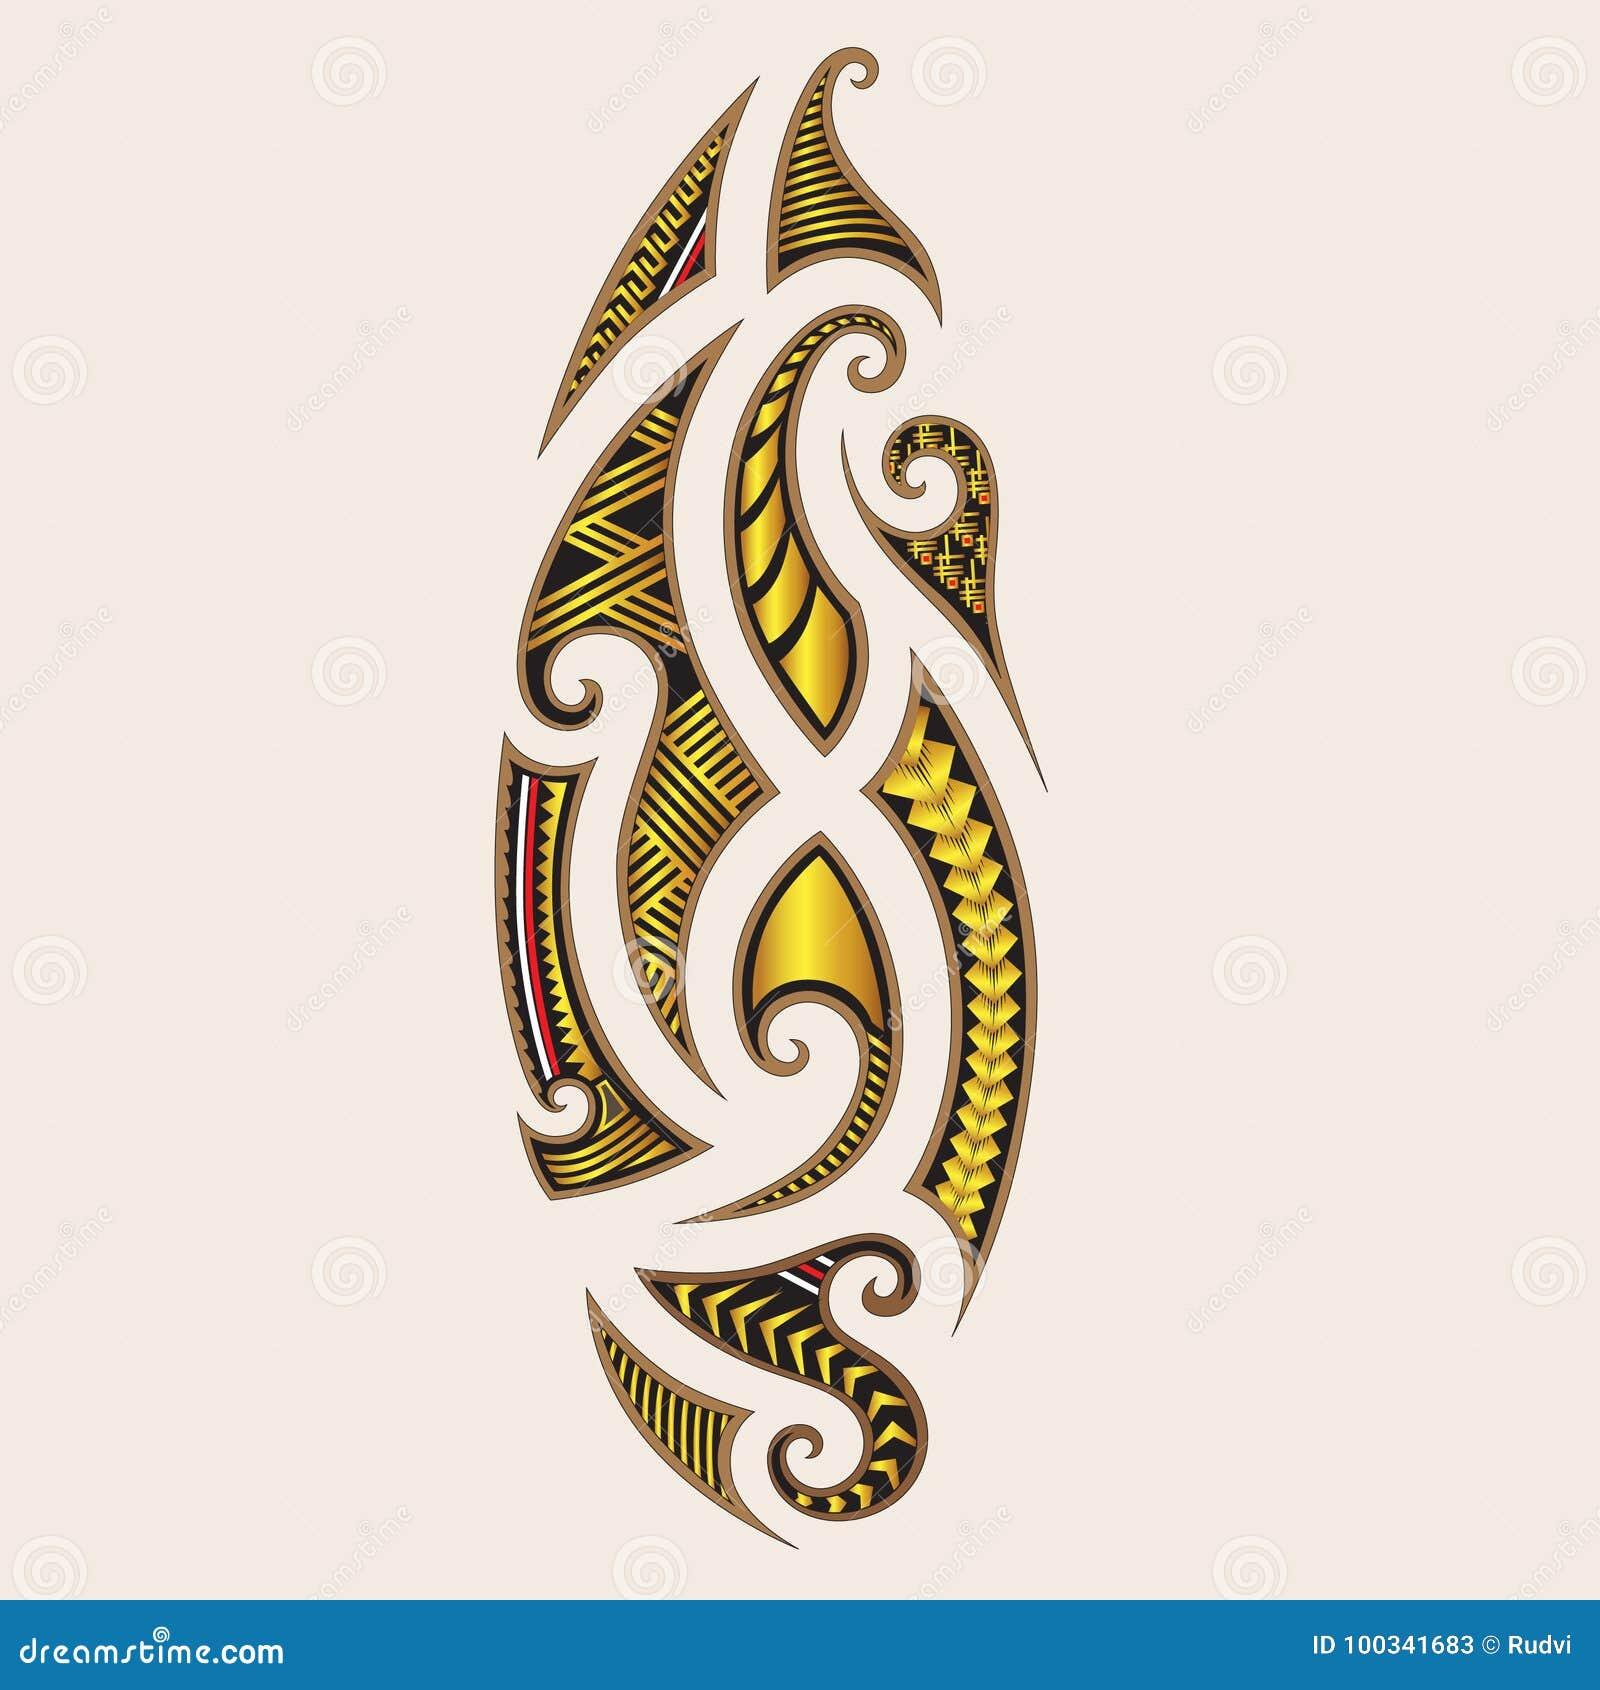 Simple Maori Designs Koyota